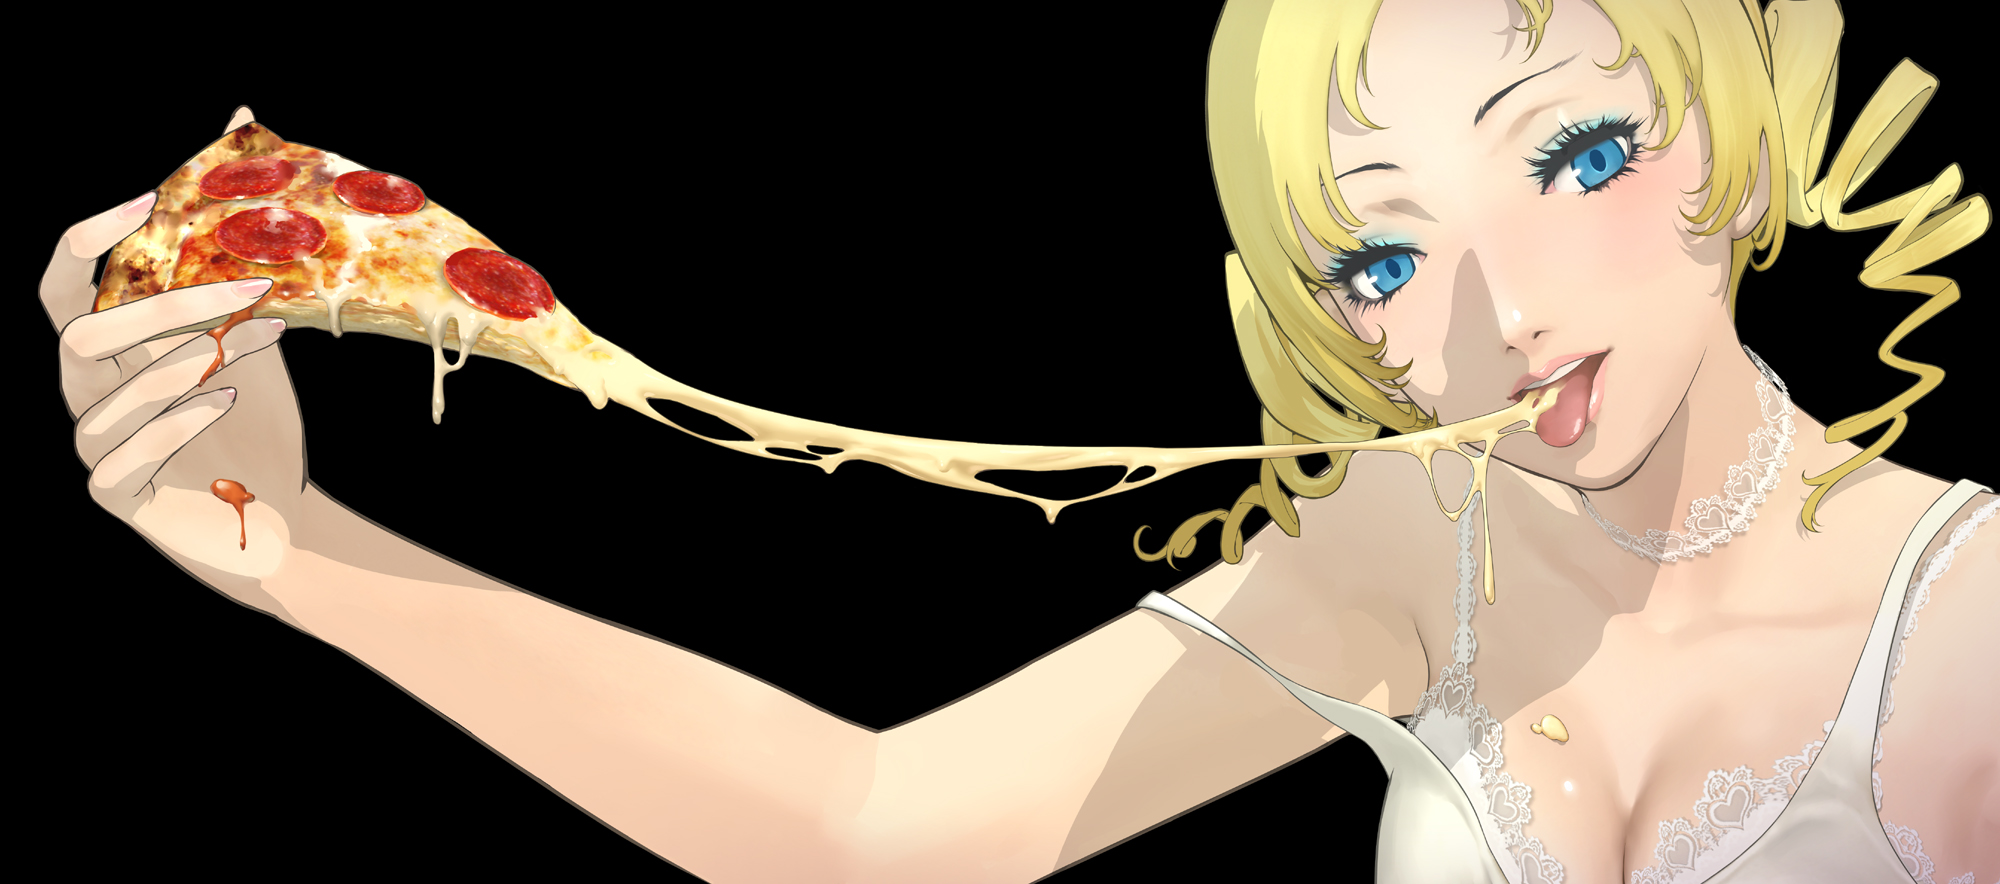 Catherine Catherine Drawn By Soejima Shigenori Danbooru